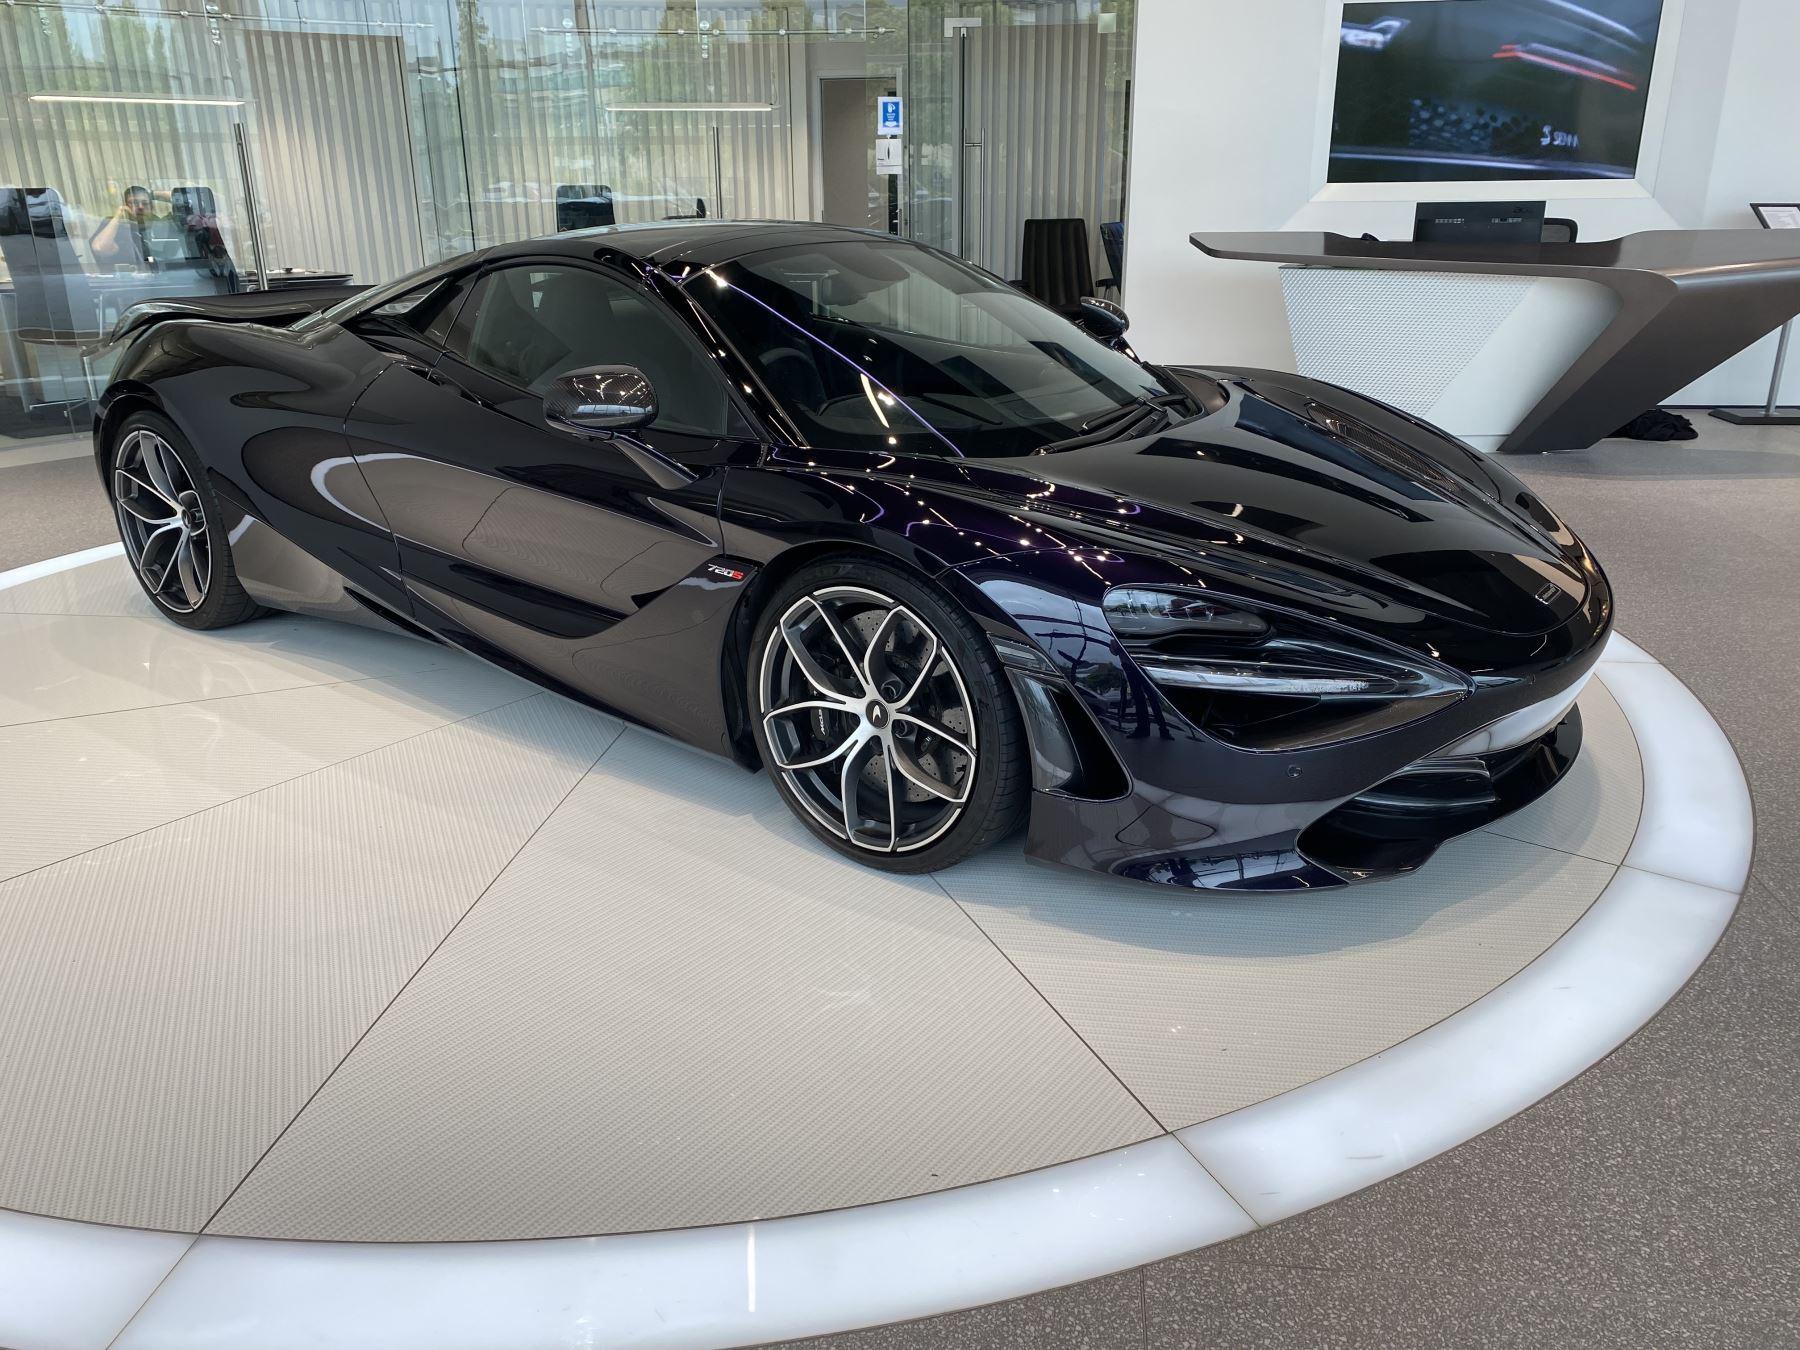 McLaren 720S Spider V8 2dr SSG  MSO PAINT SPOORTS EXHAUST SUPERB VALUE 4.0 Automatic Convertible